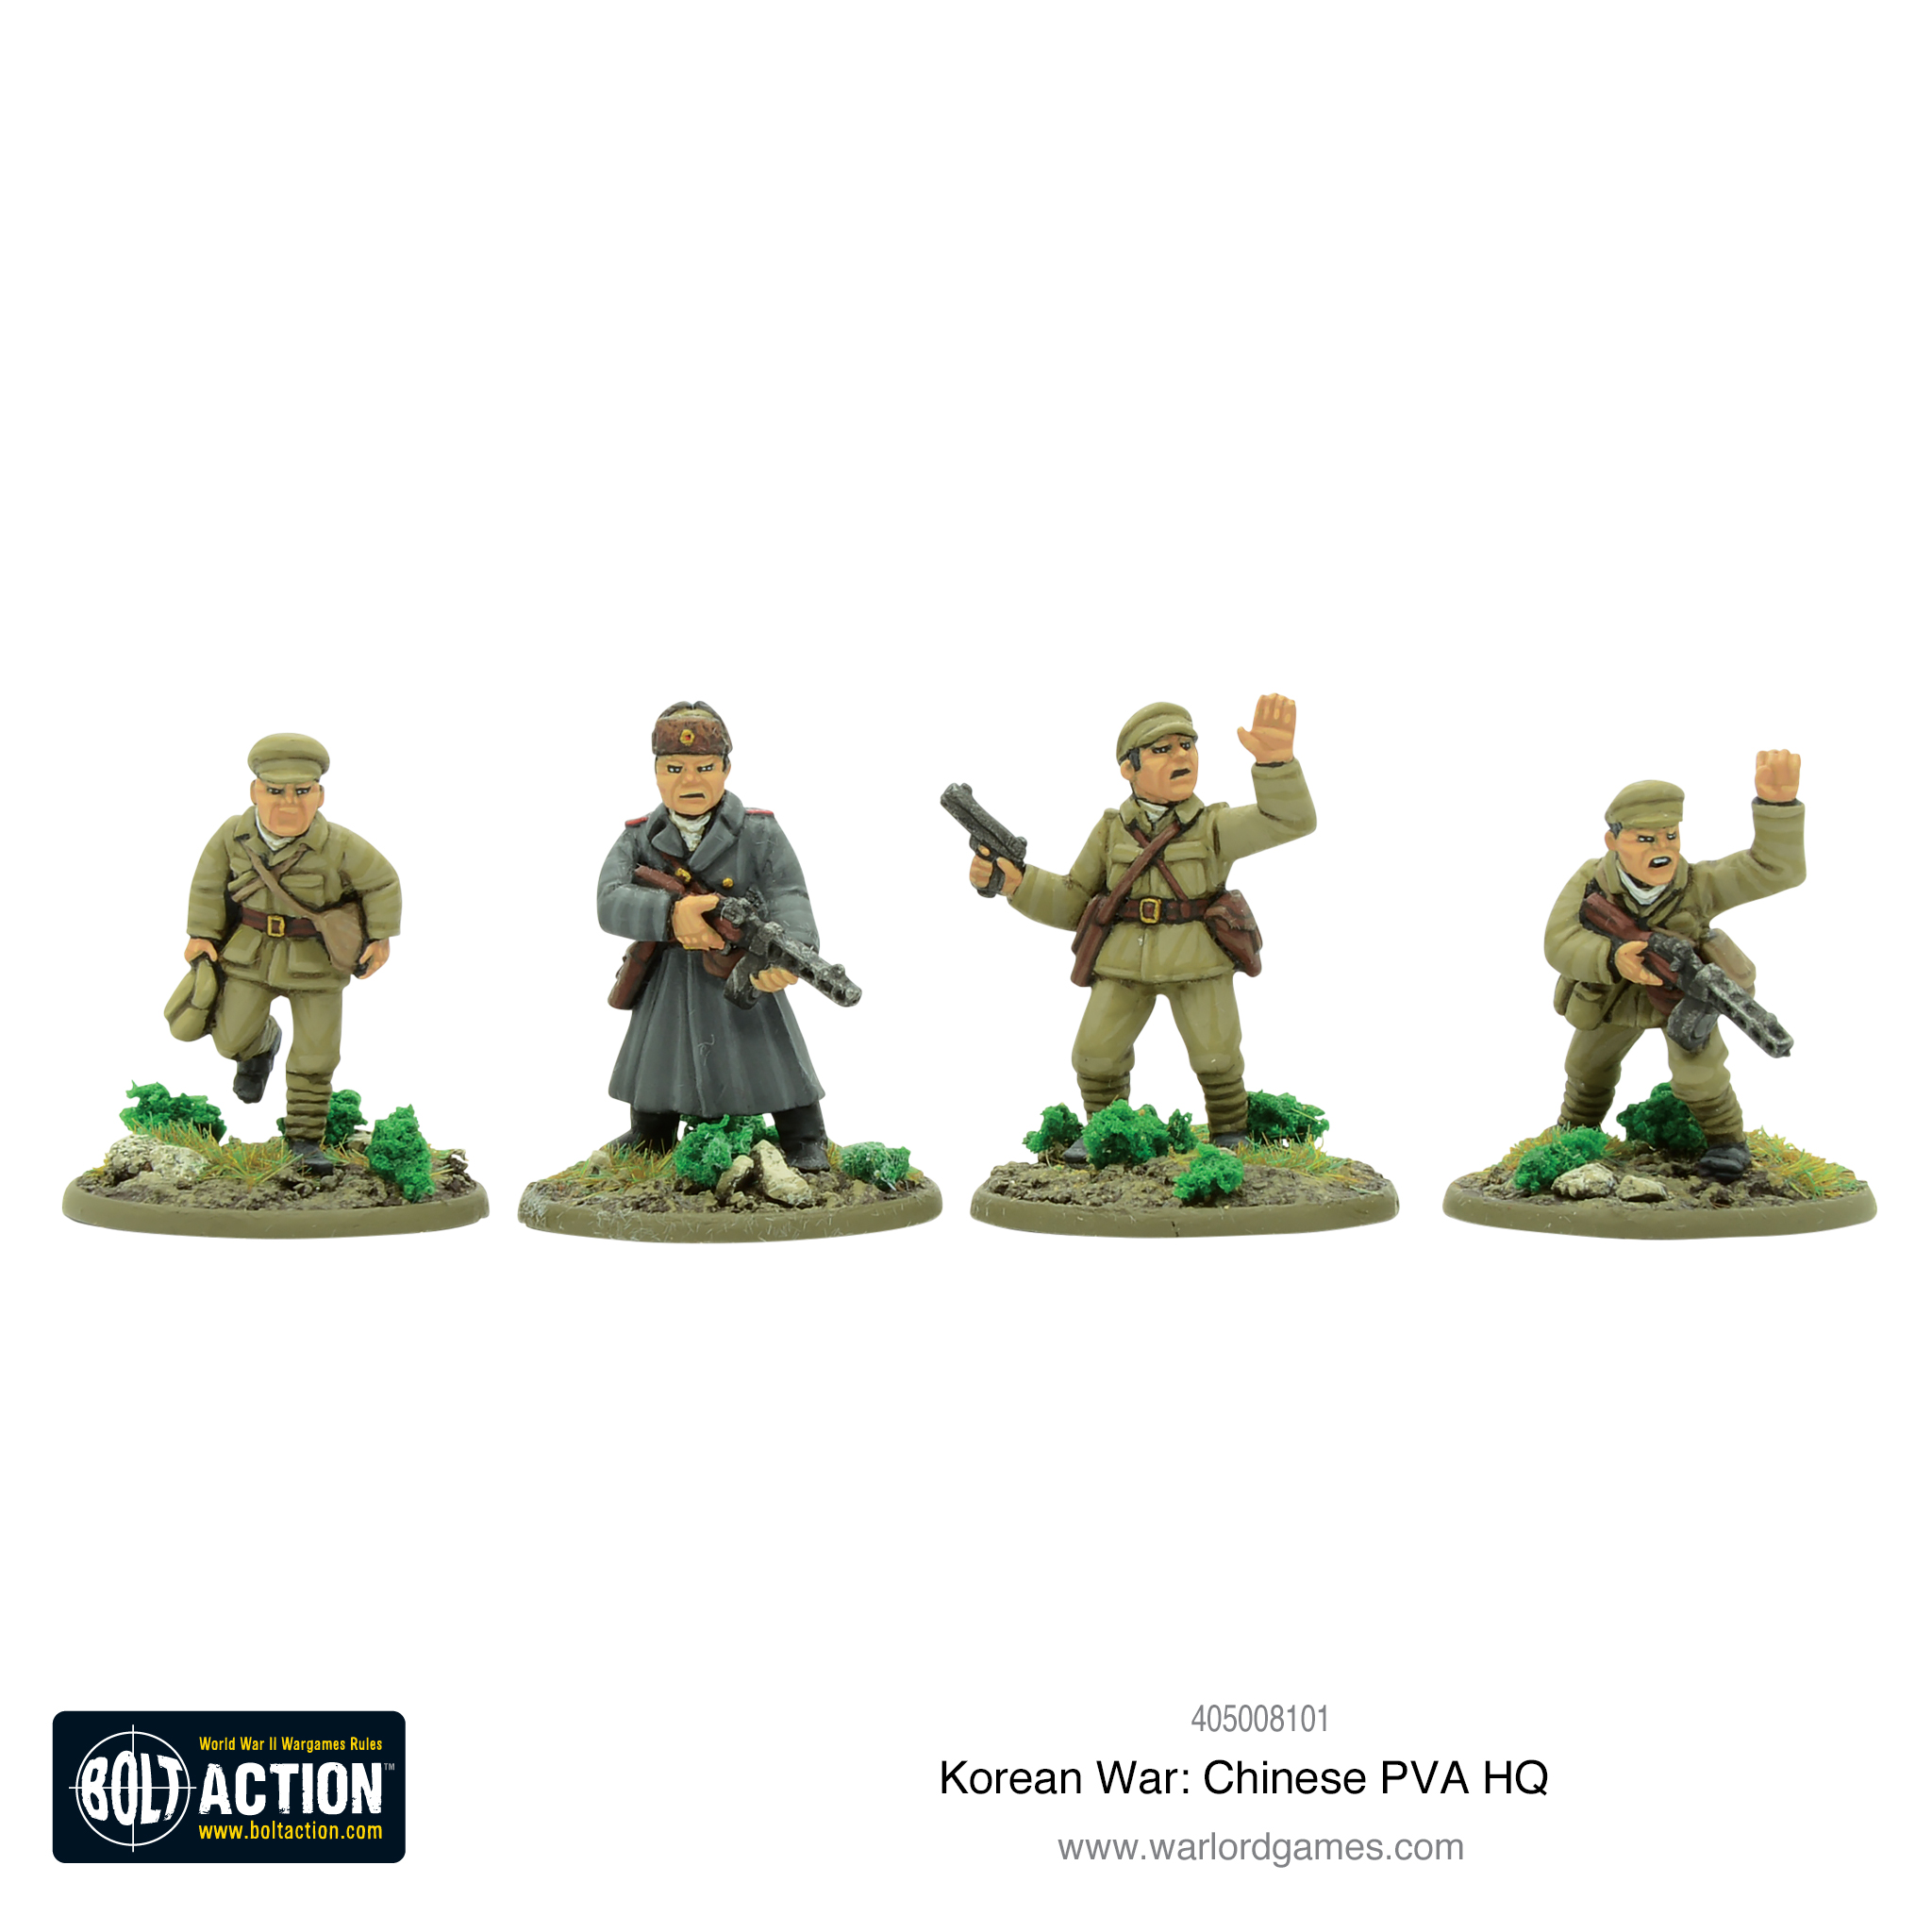 Korean War: Chinese PVA HQ